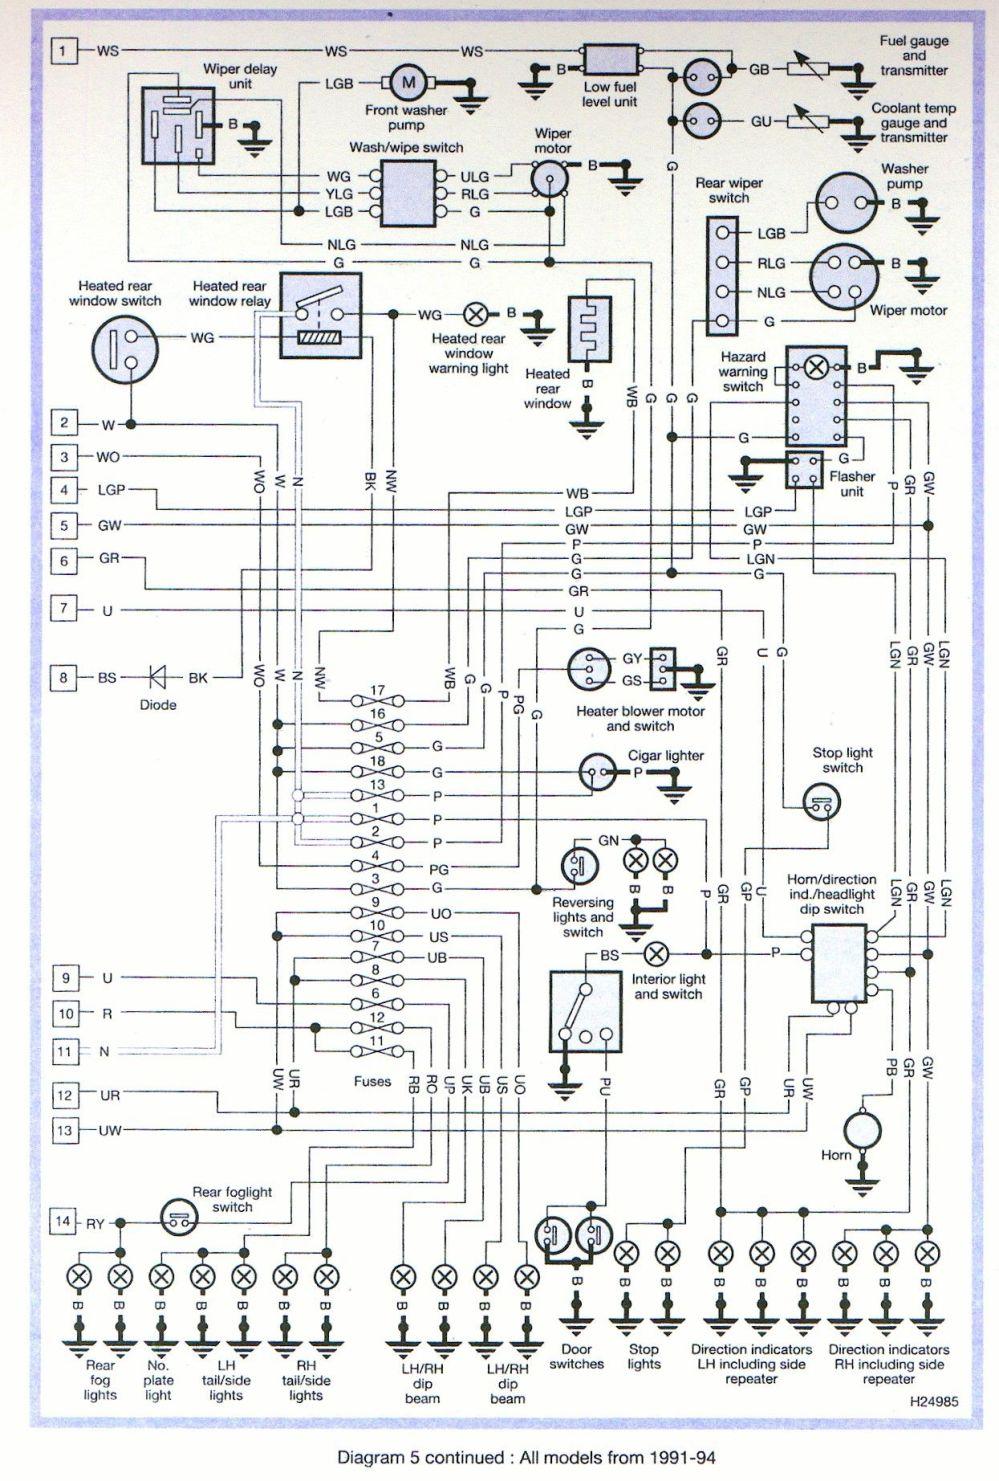 medium resolution of 1994 chrysler lebaron wiring diagram 1994 geo prizm wiring 1995 geo metro fuse box diagram 2001